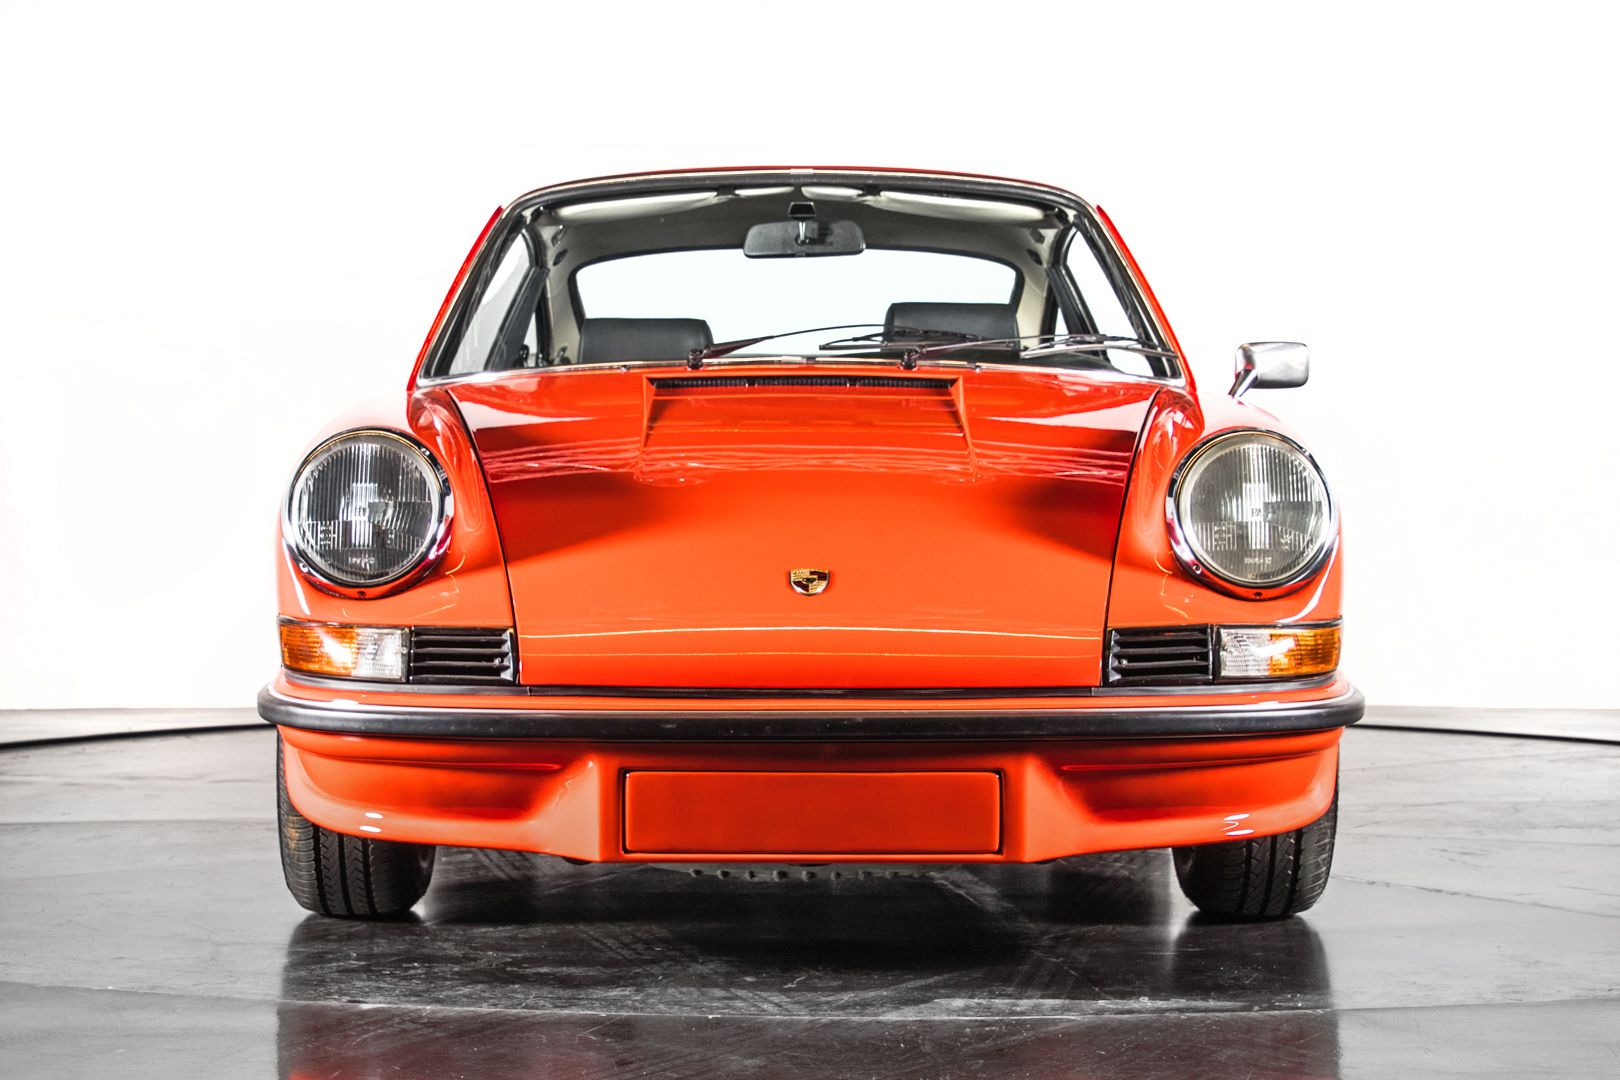 1973 Porsche 911 Carrera 2.7 RS 44391